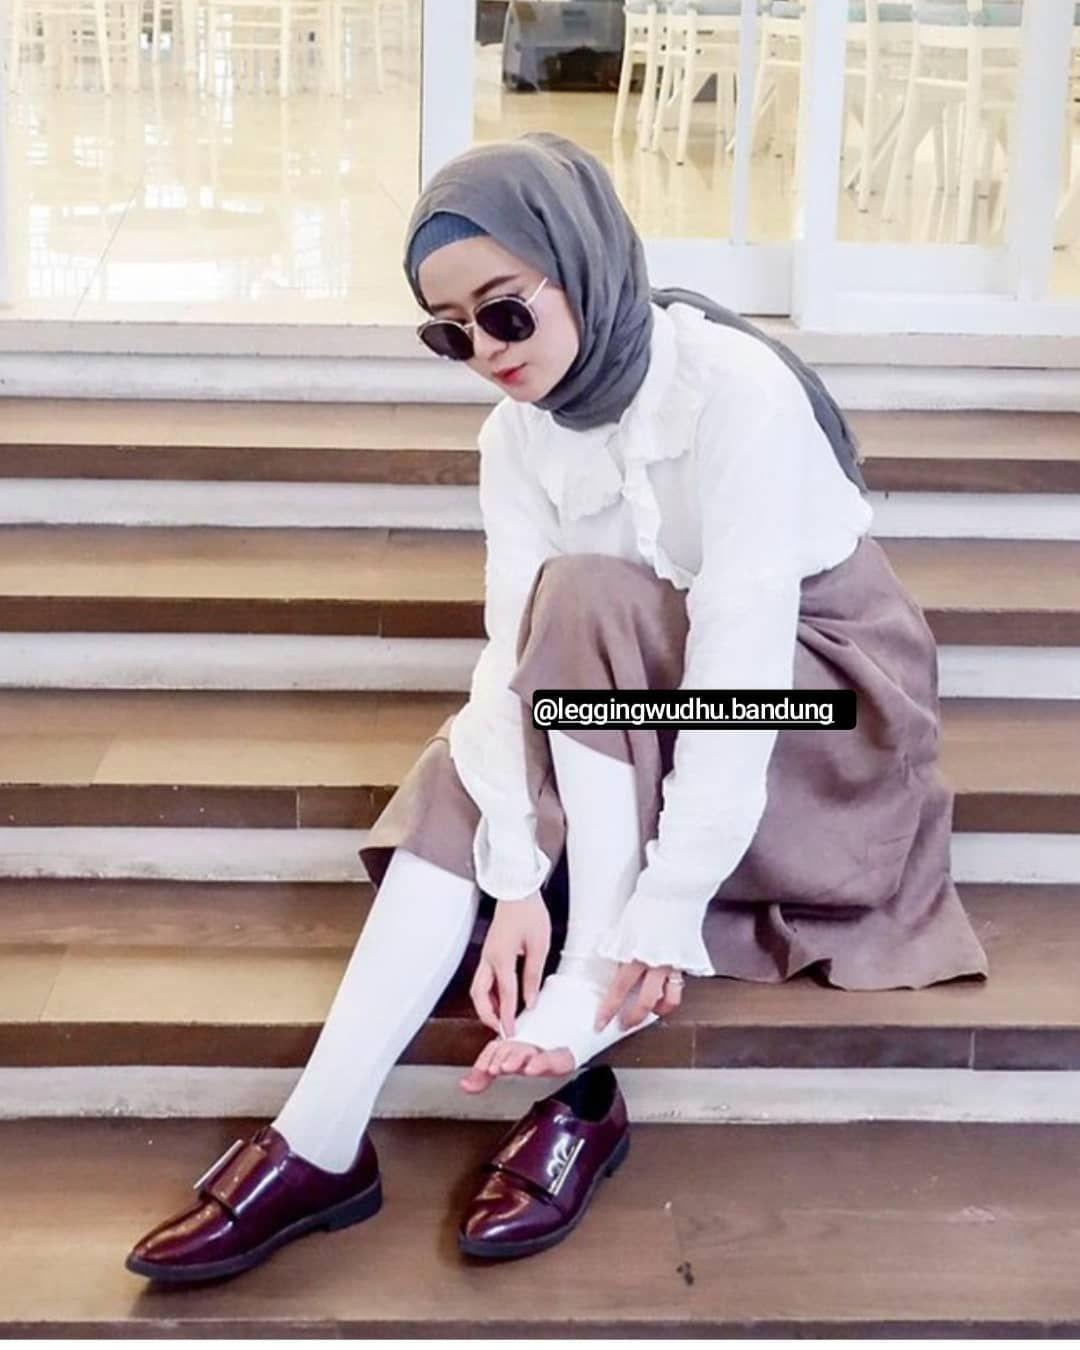 Legging Wudhu Premium Ready Legging Wudhu Premium Outfee Leggy Harga Rp Legging Wudhu Premium Ready Legging Wudhu Premium Outfee Fashion Legging Hijab